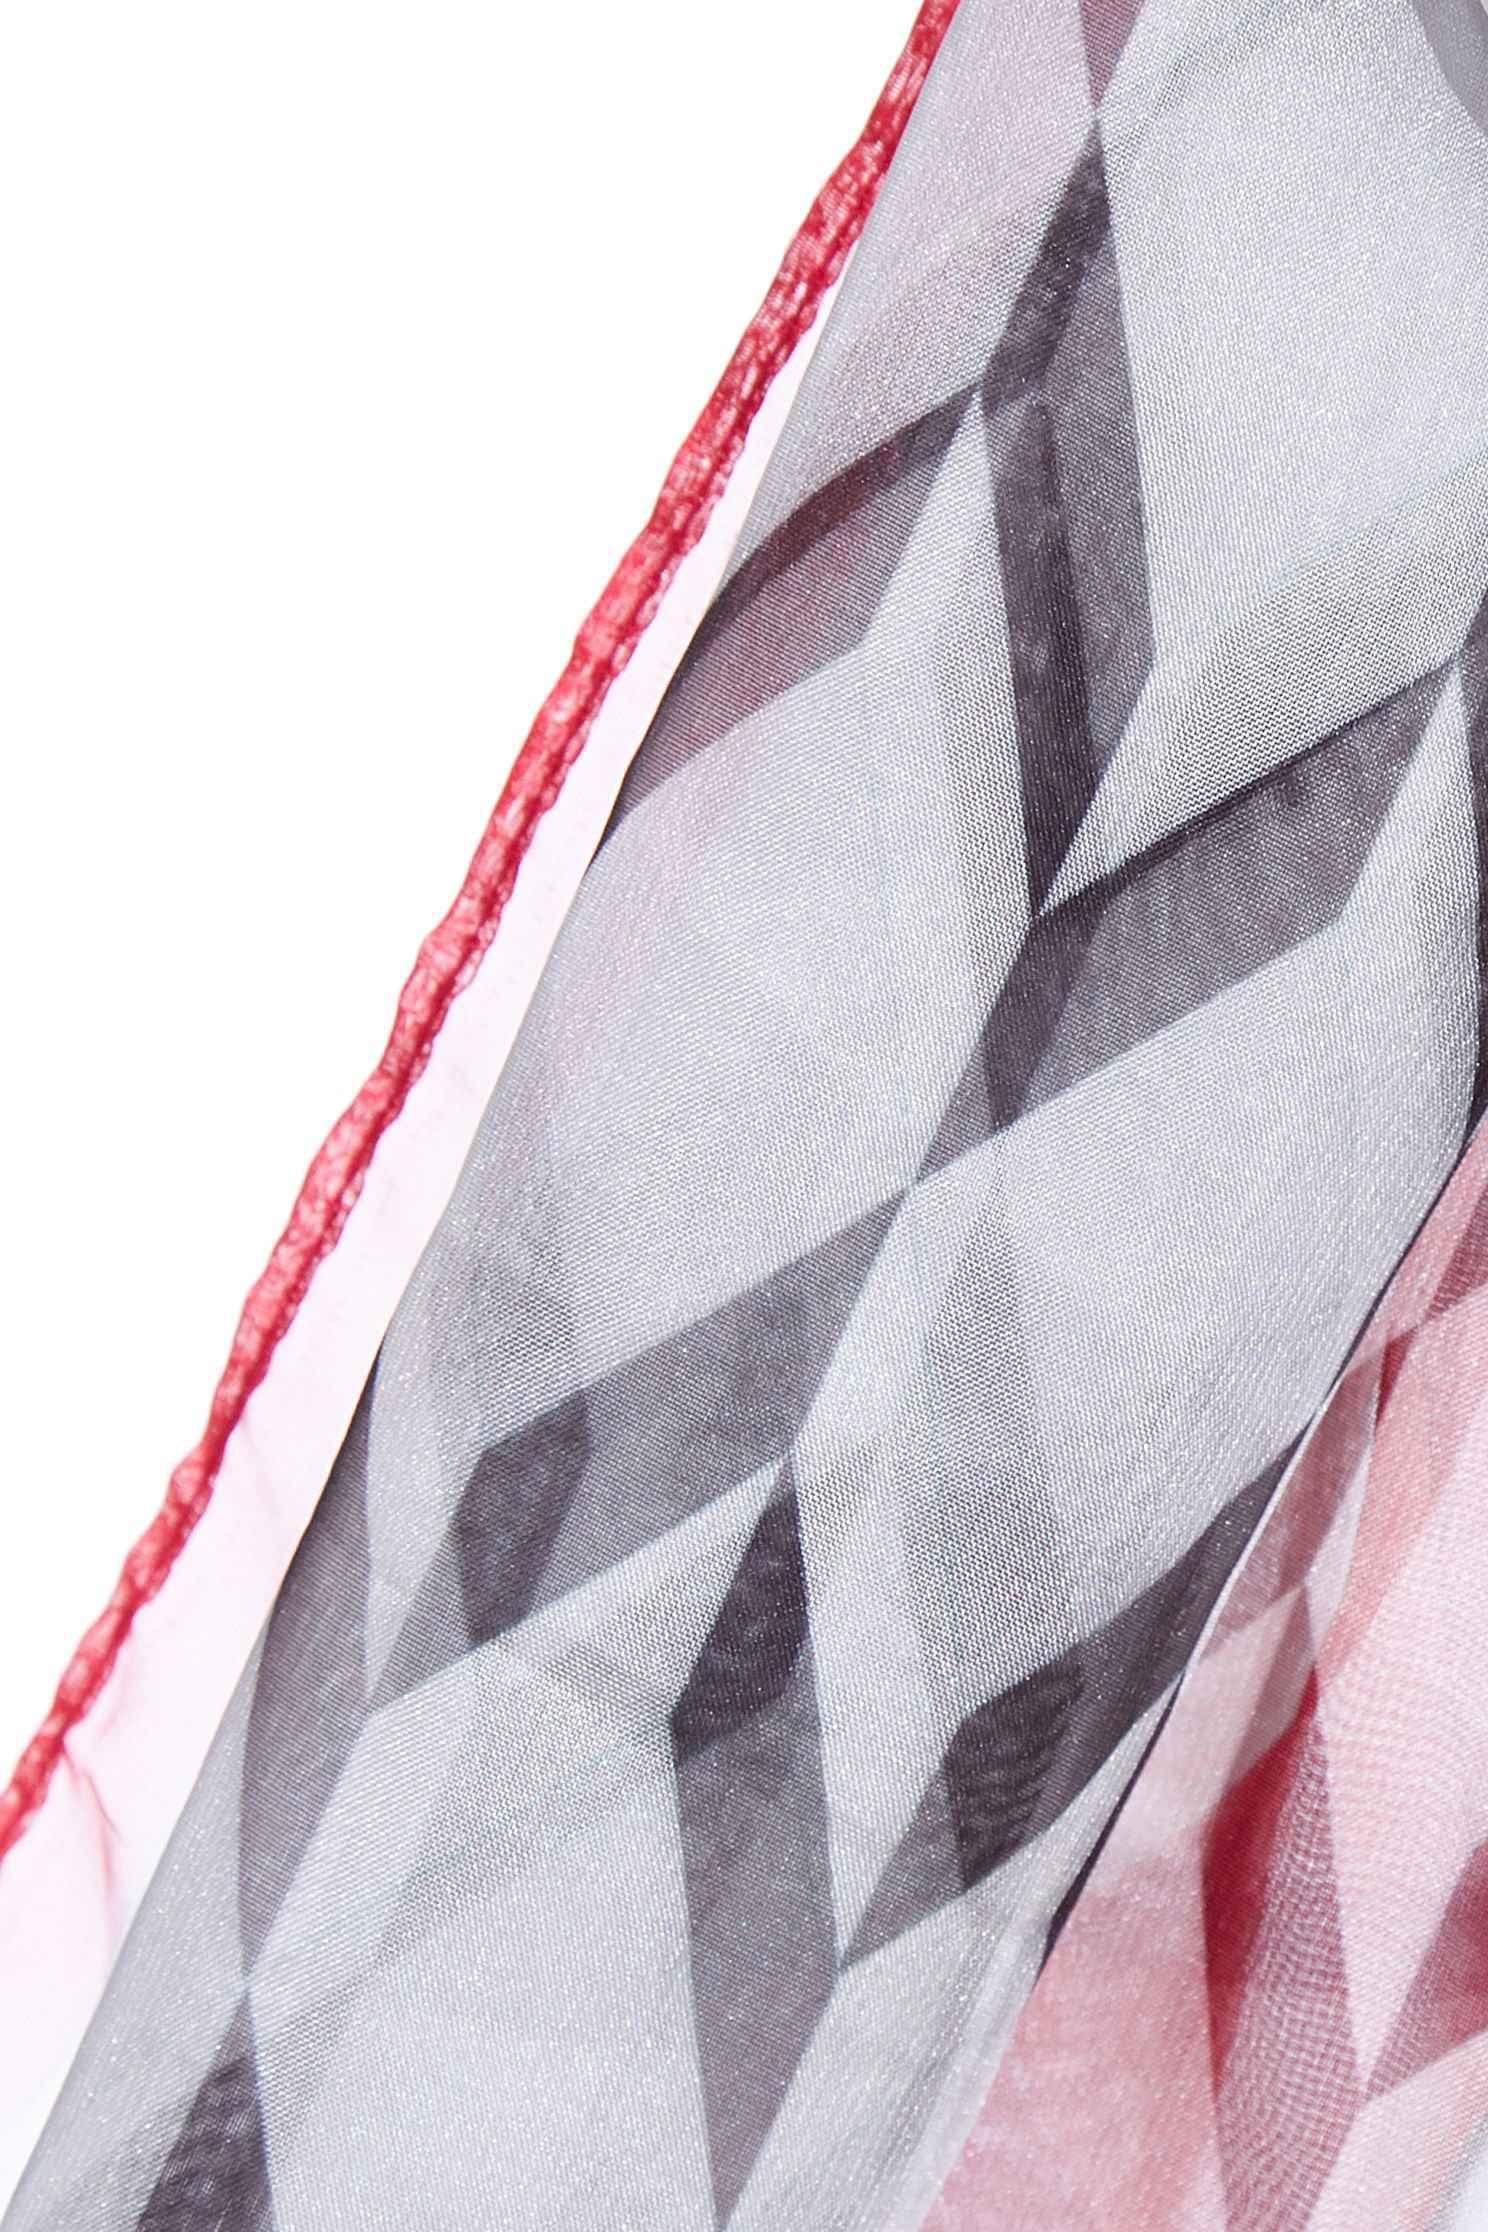 iROO original geometric printed silk scarf,Chiffon